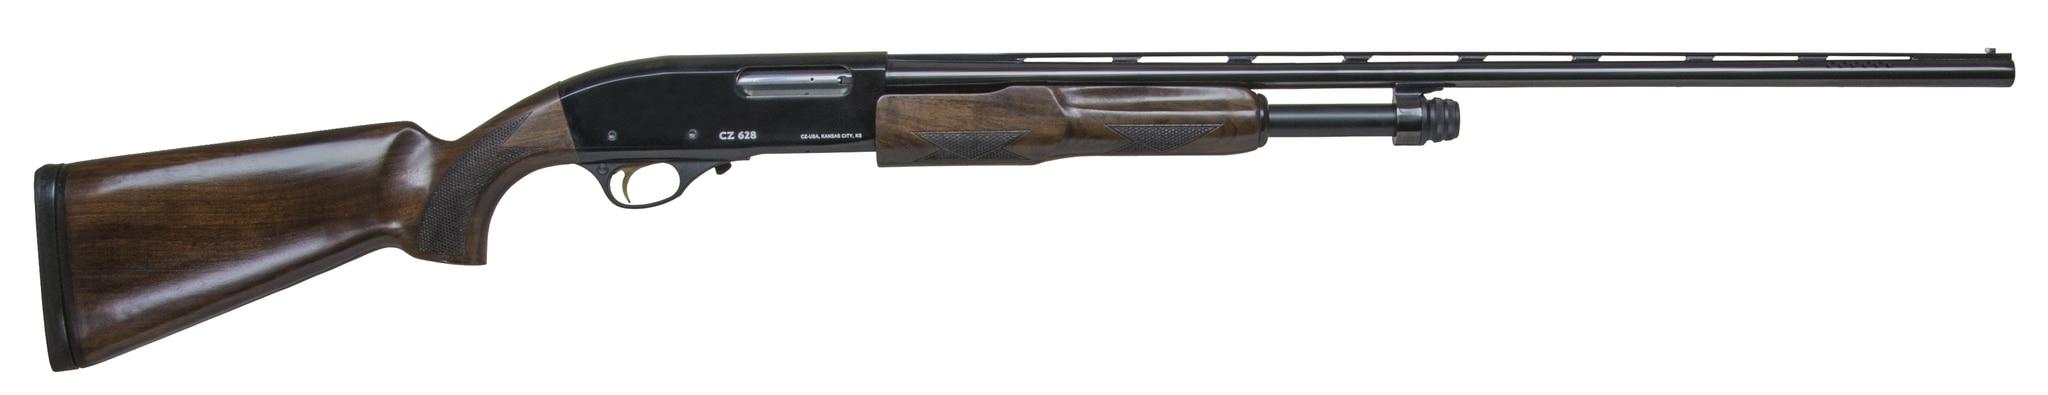 2017 Shotguns -- CZ-USA